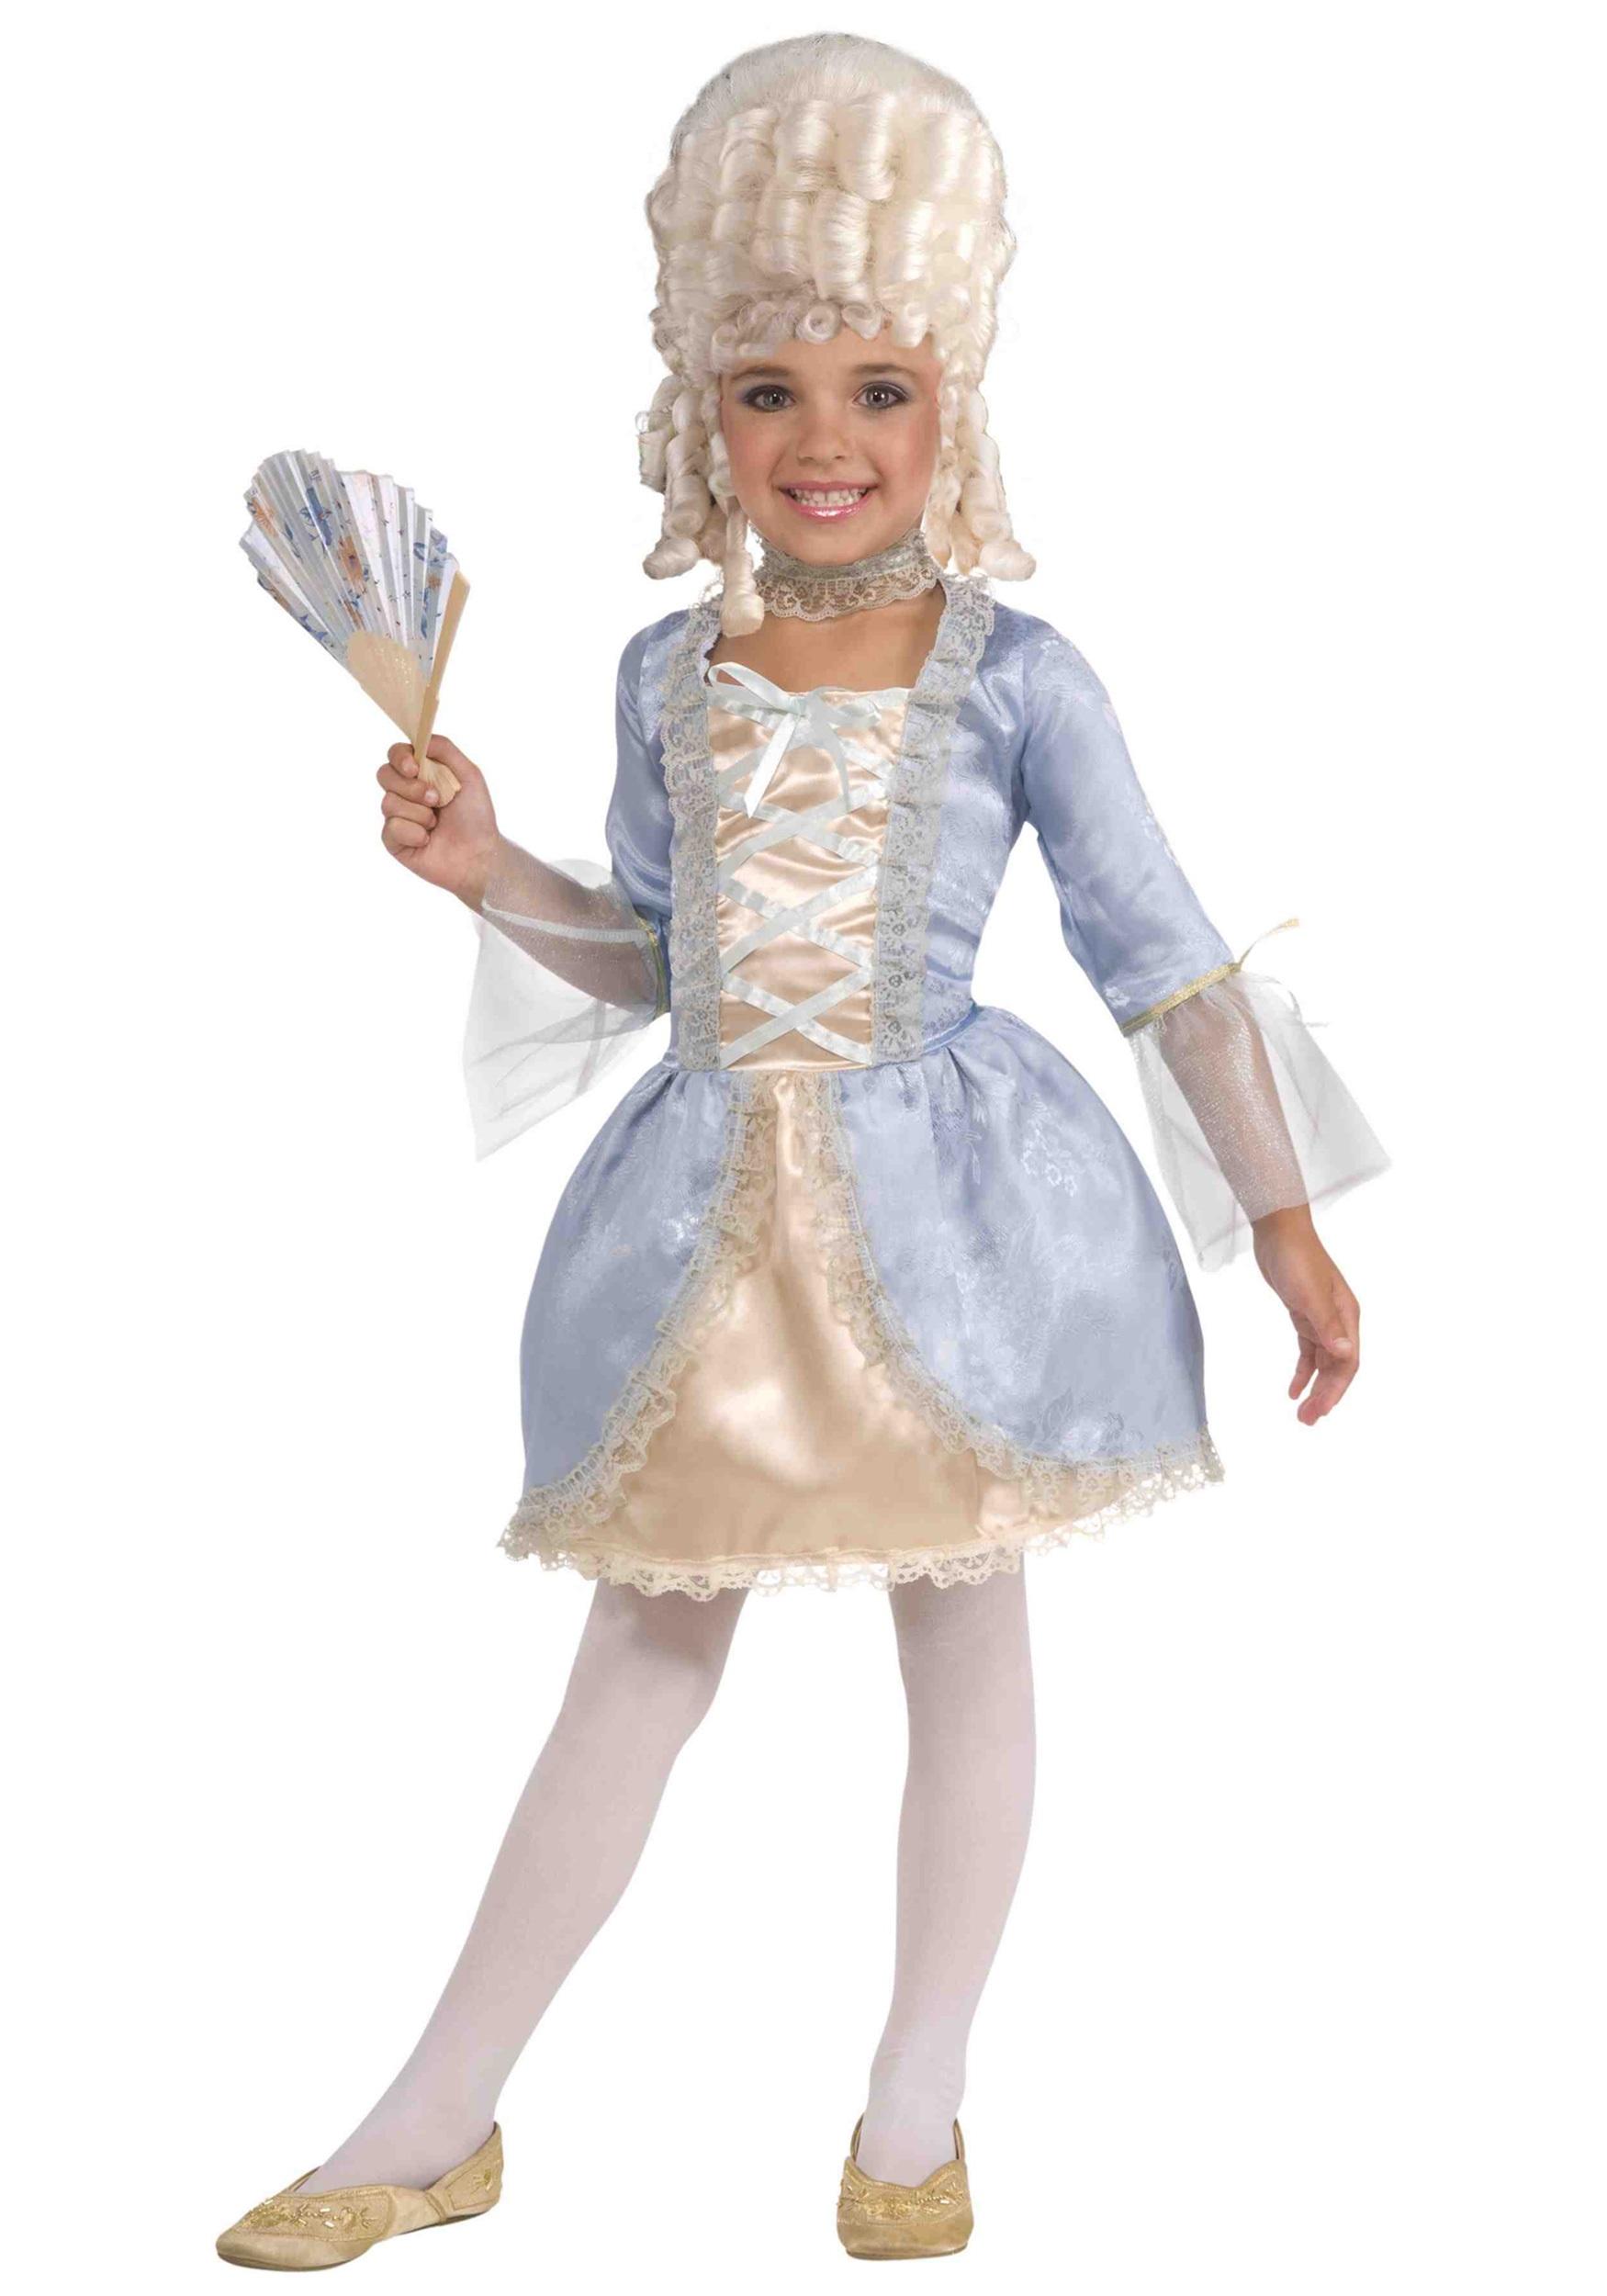 Child Marie Antoinette Costume  sc 1 st  Halloween Costumes & Child Marie Antoinette Costume - Halloween Costumes